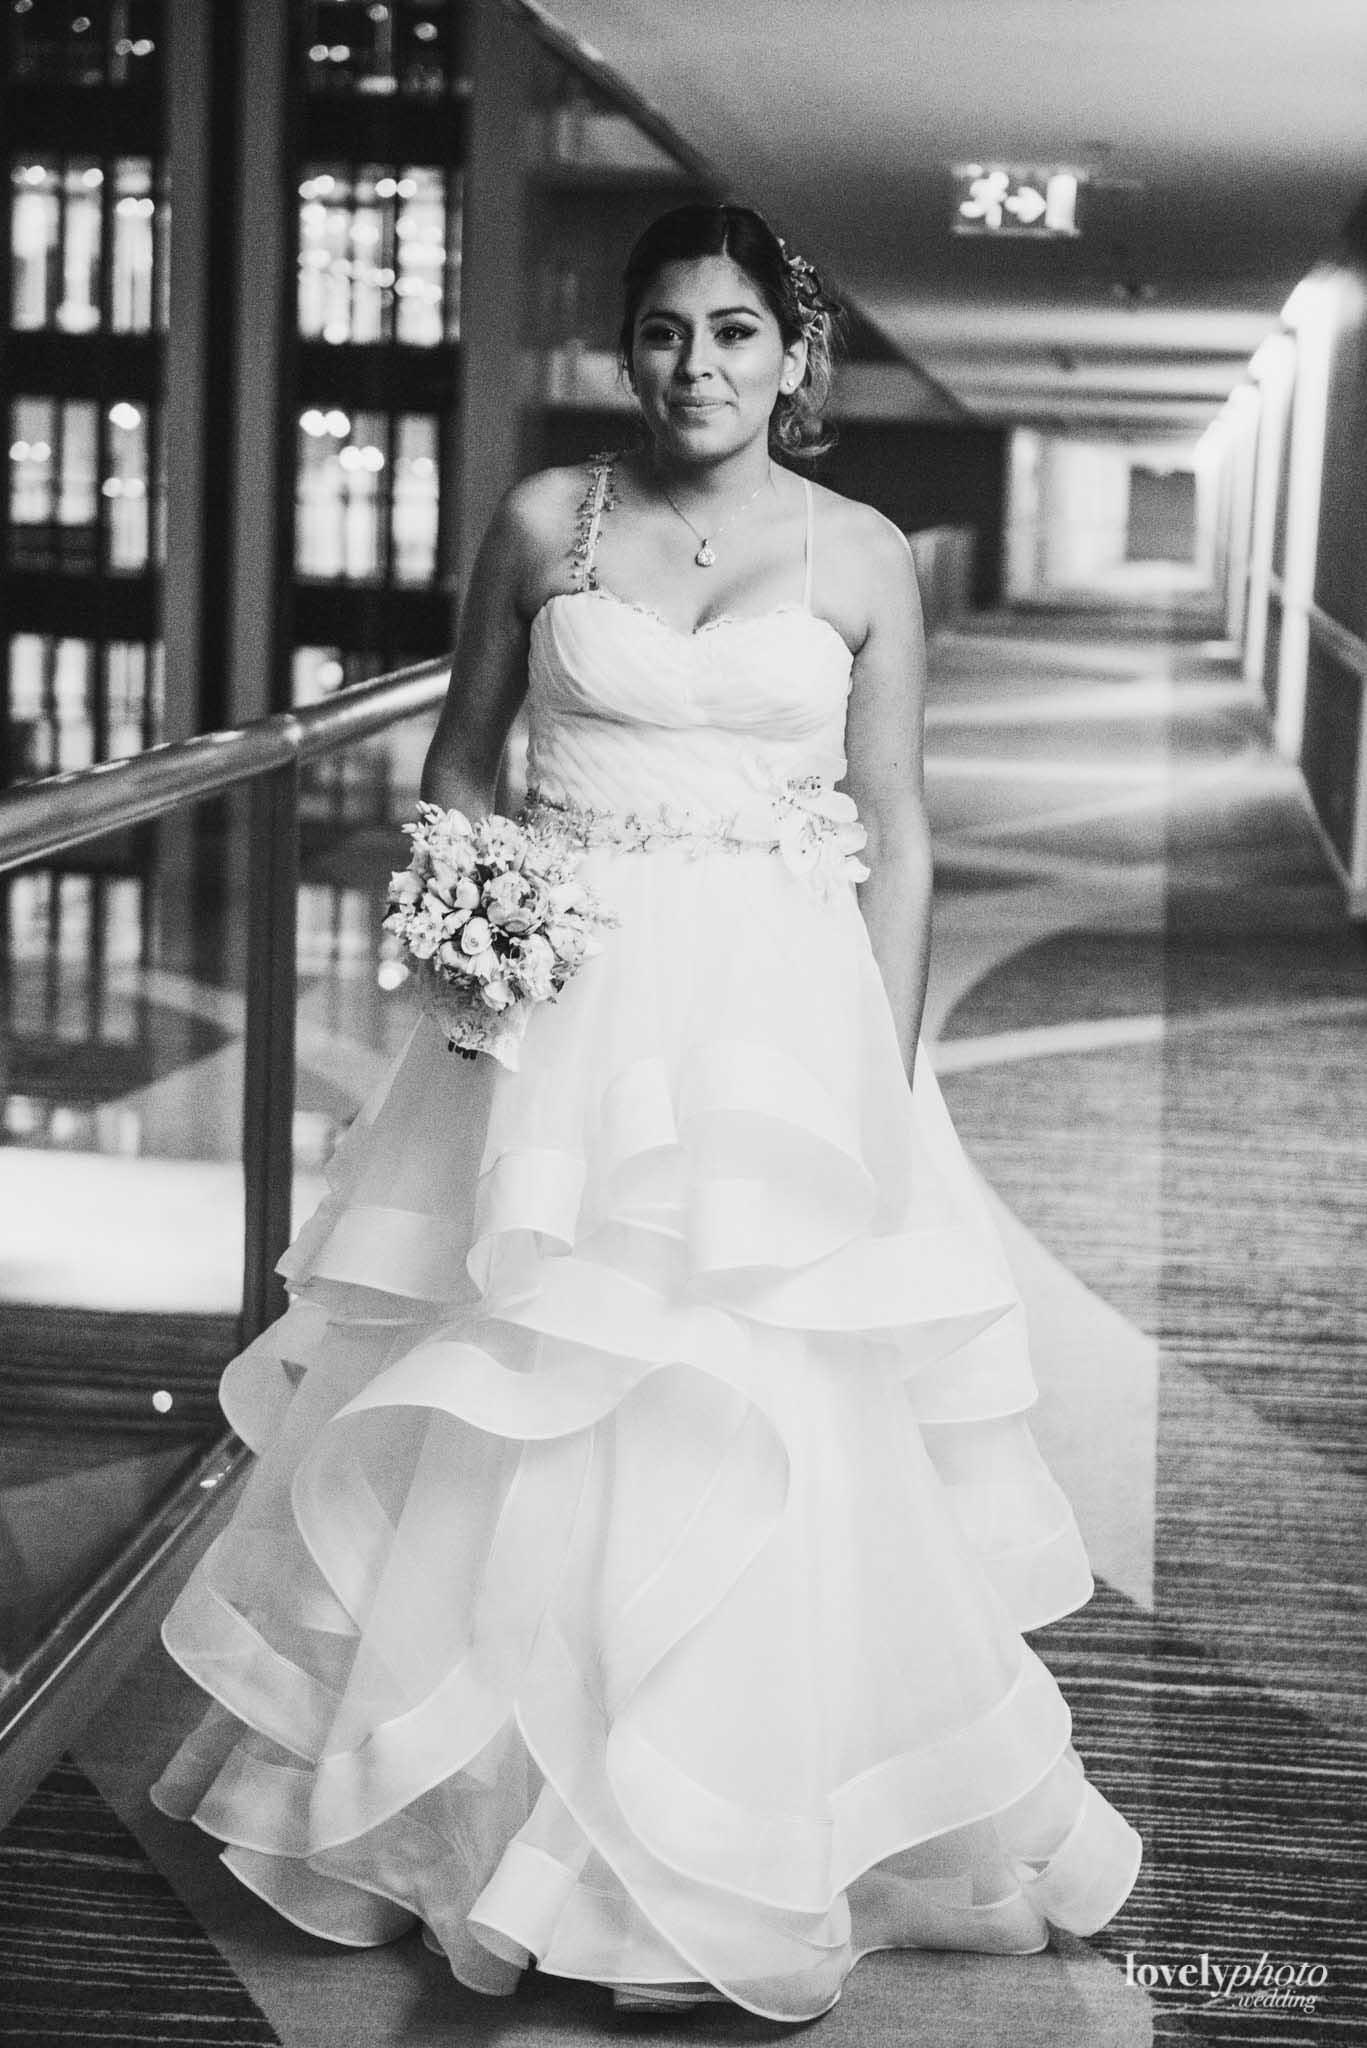 fotografo, bodas, casamiento, casamientos, wedding photographer, elopement, engagement, buenos aires Lovely Photo